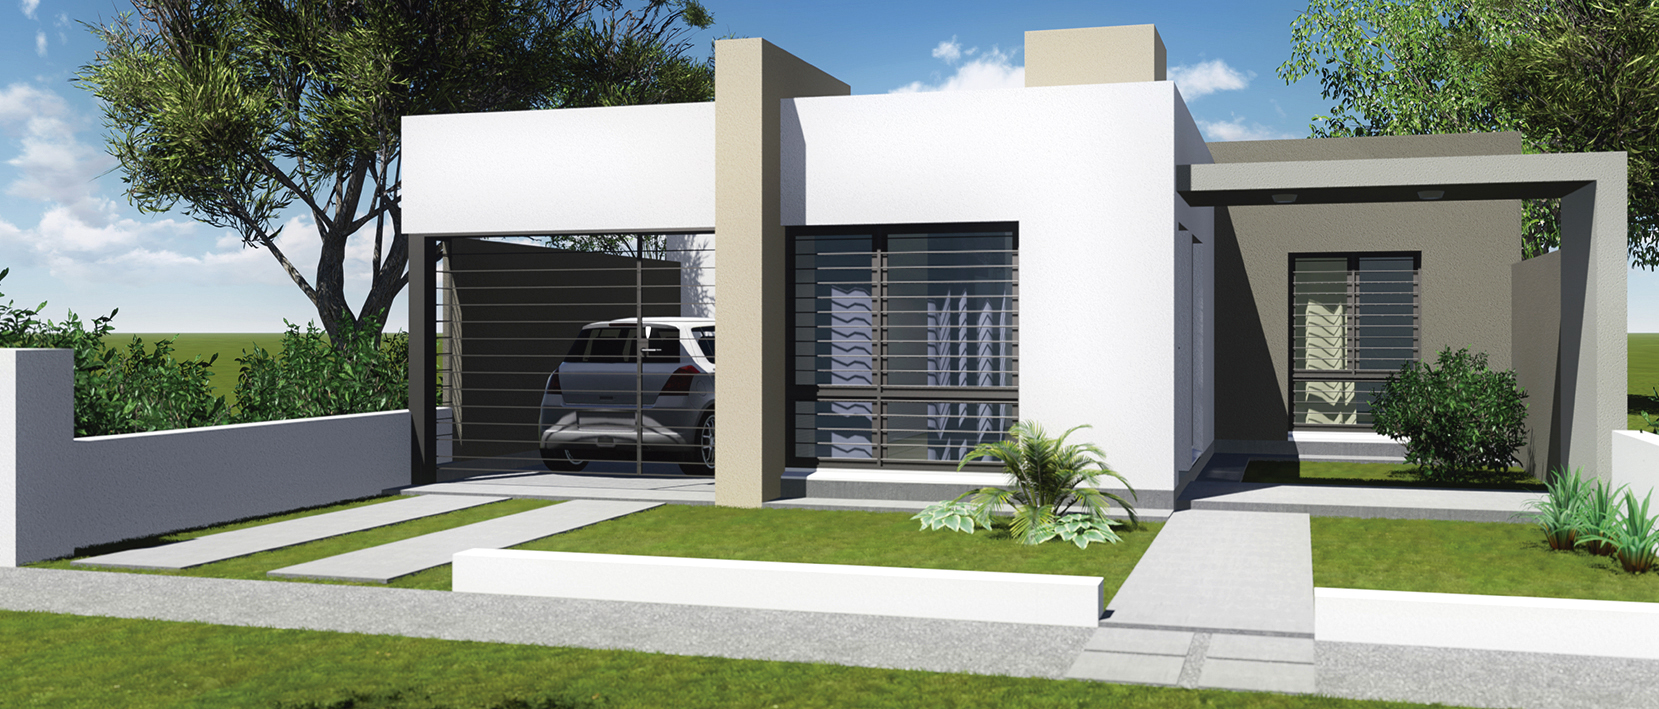 Vivienda mejorada contempor nea cooperativa horizonte for Interiores de viviendas